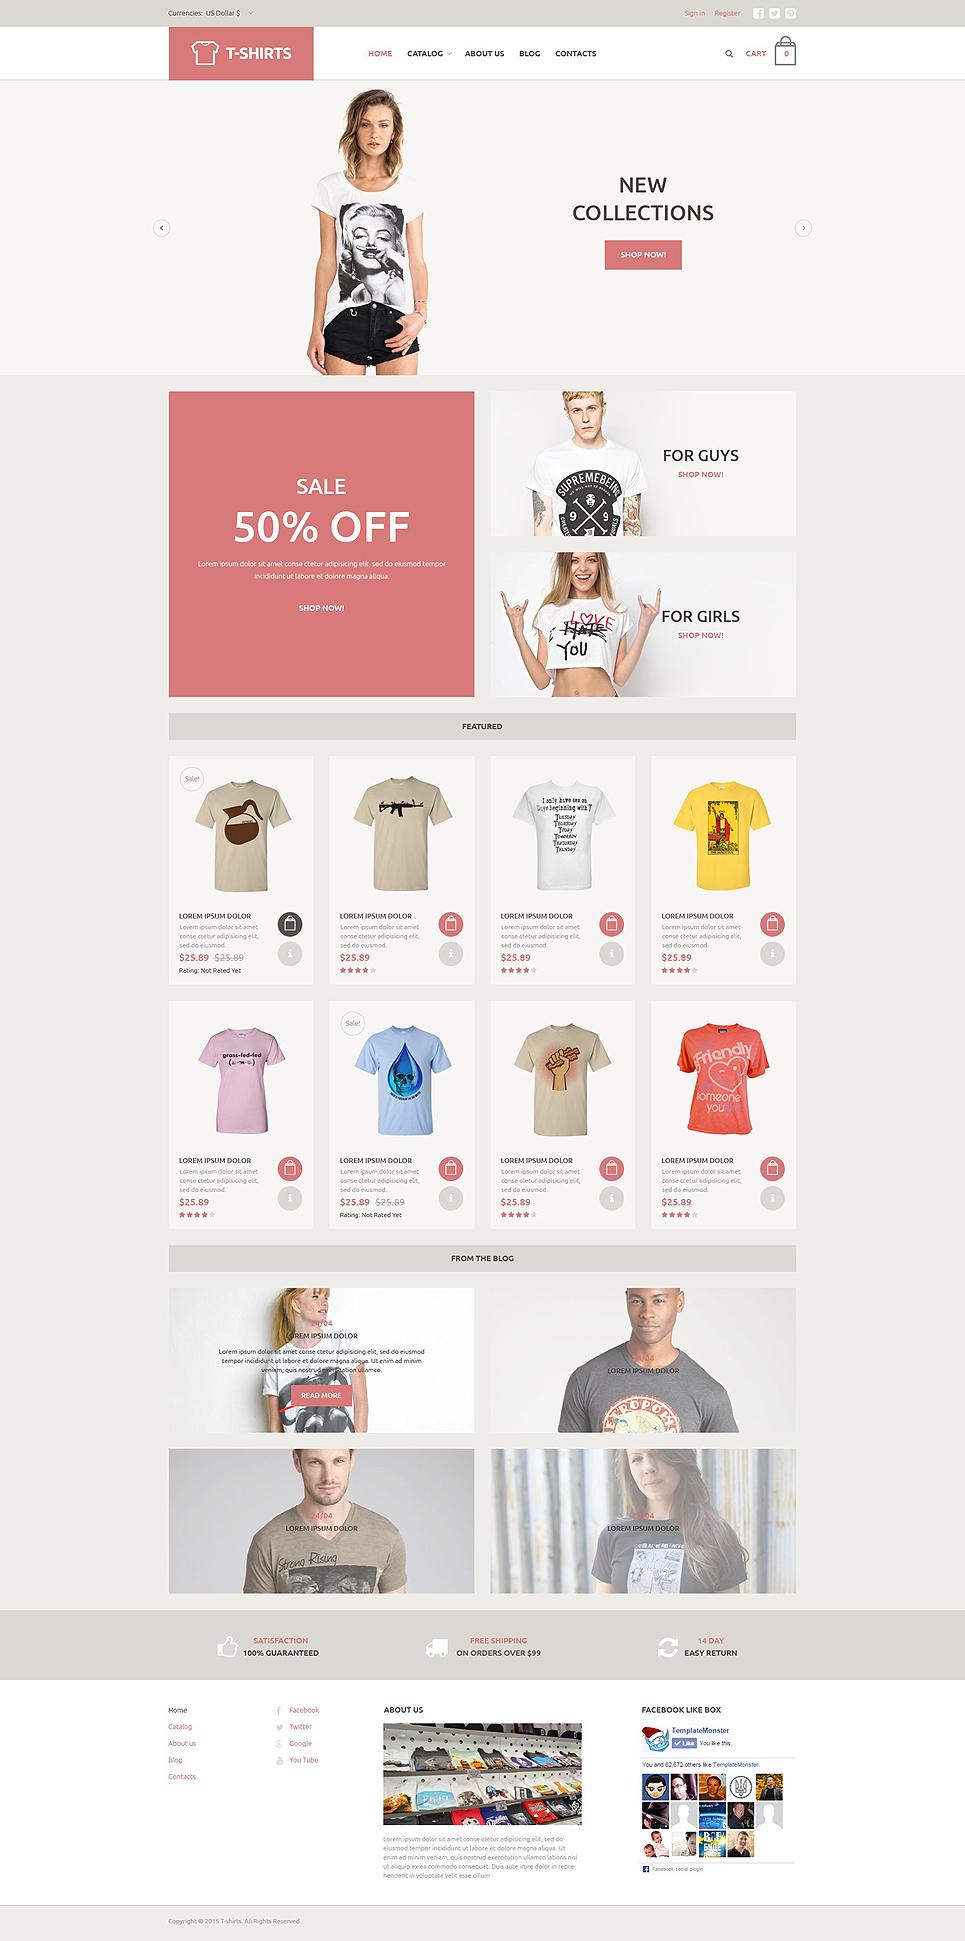 Joomla tshirt design - Joomla Tshirt Design 12